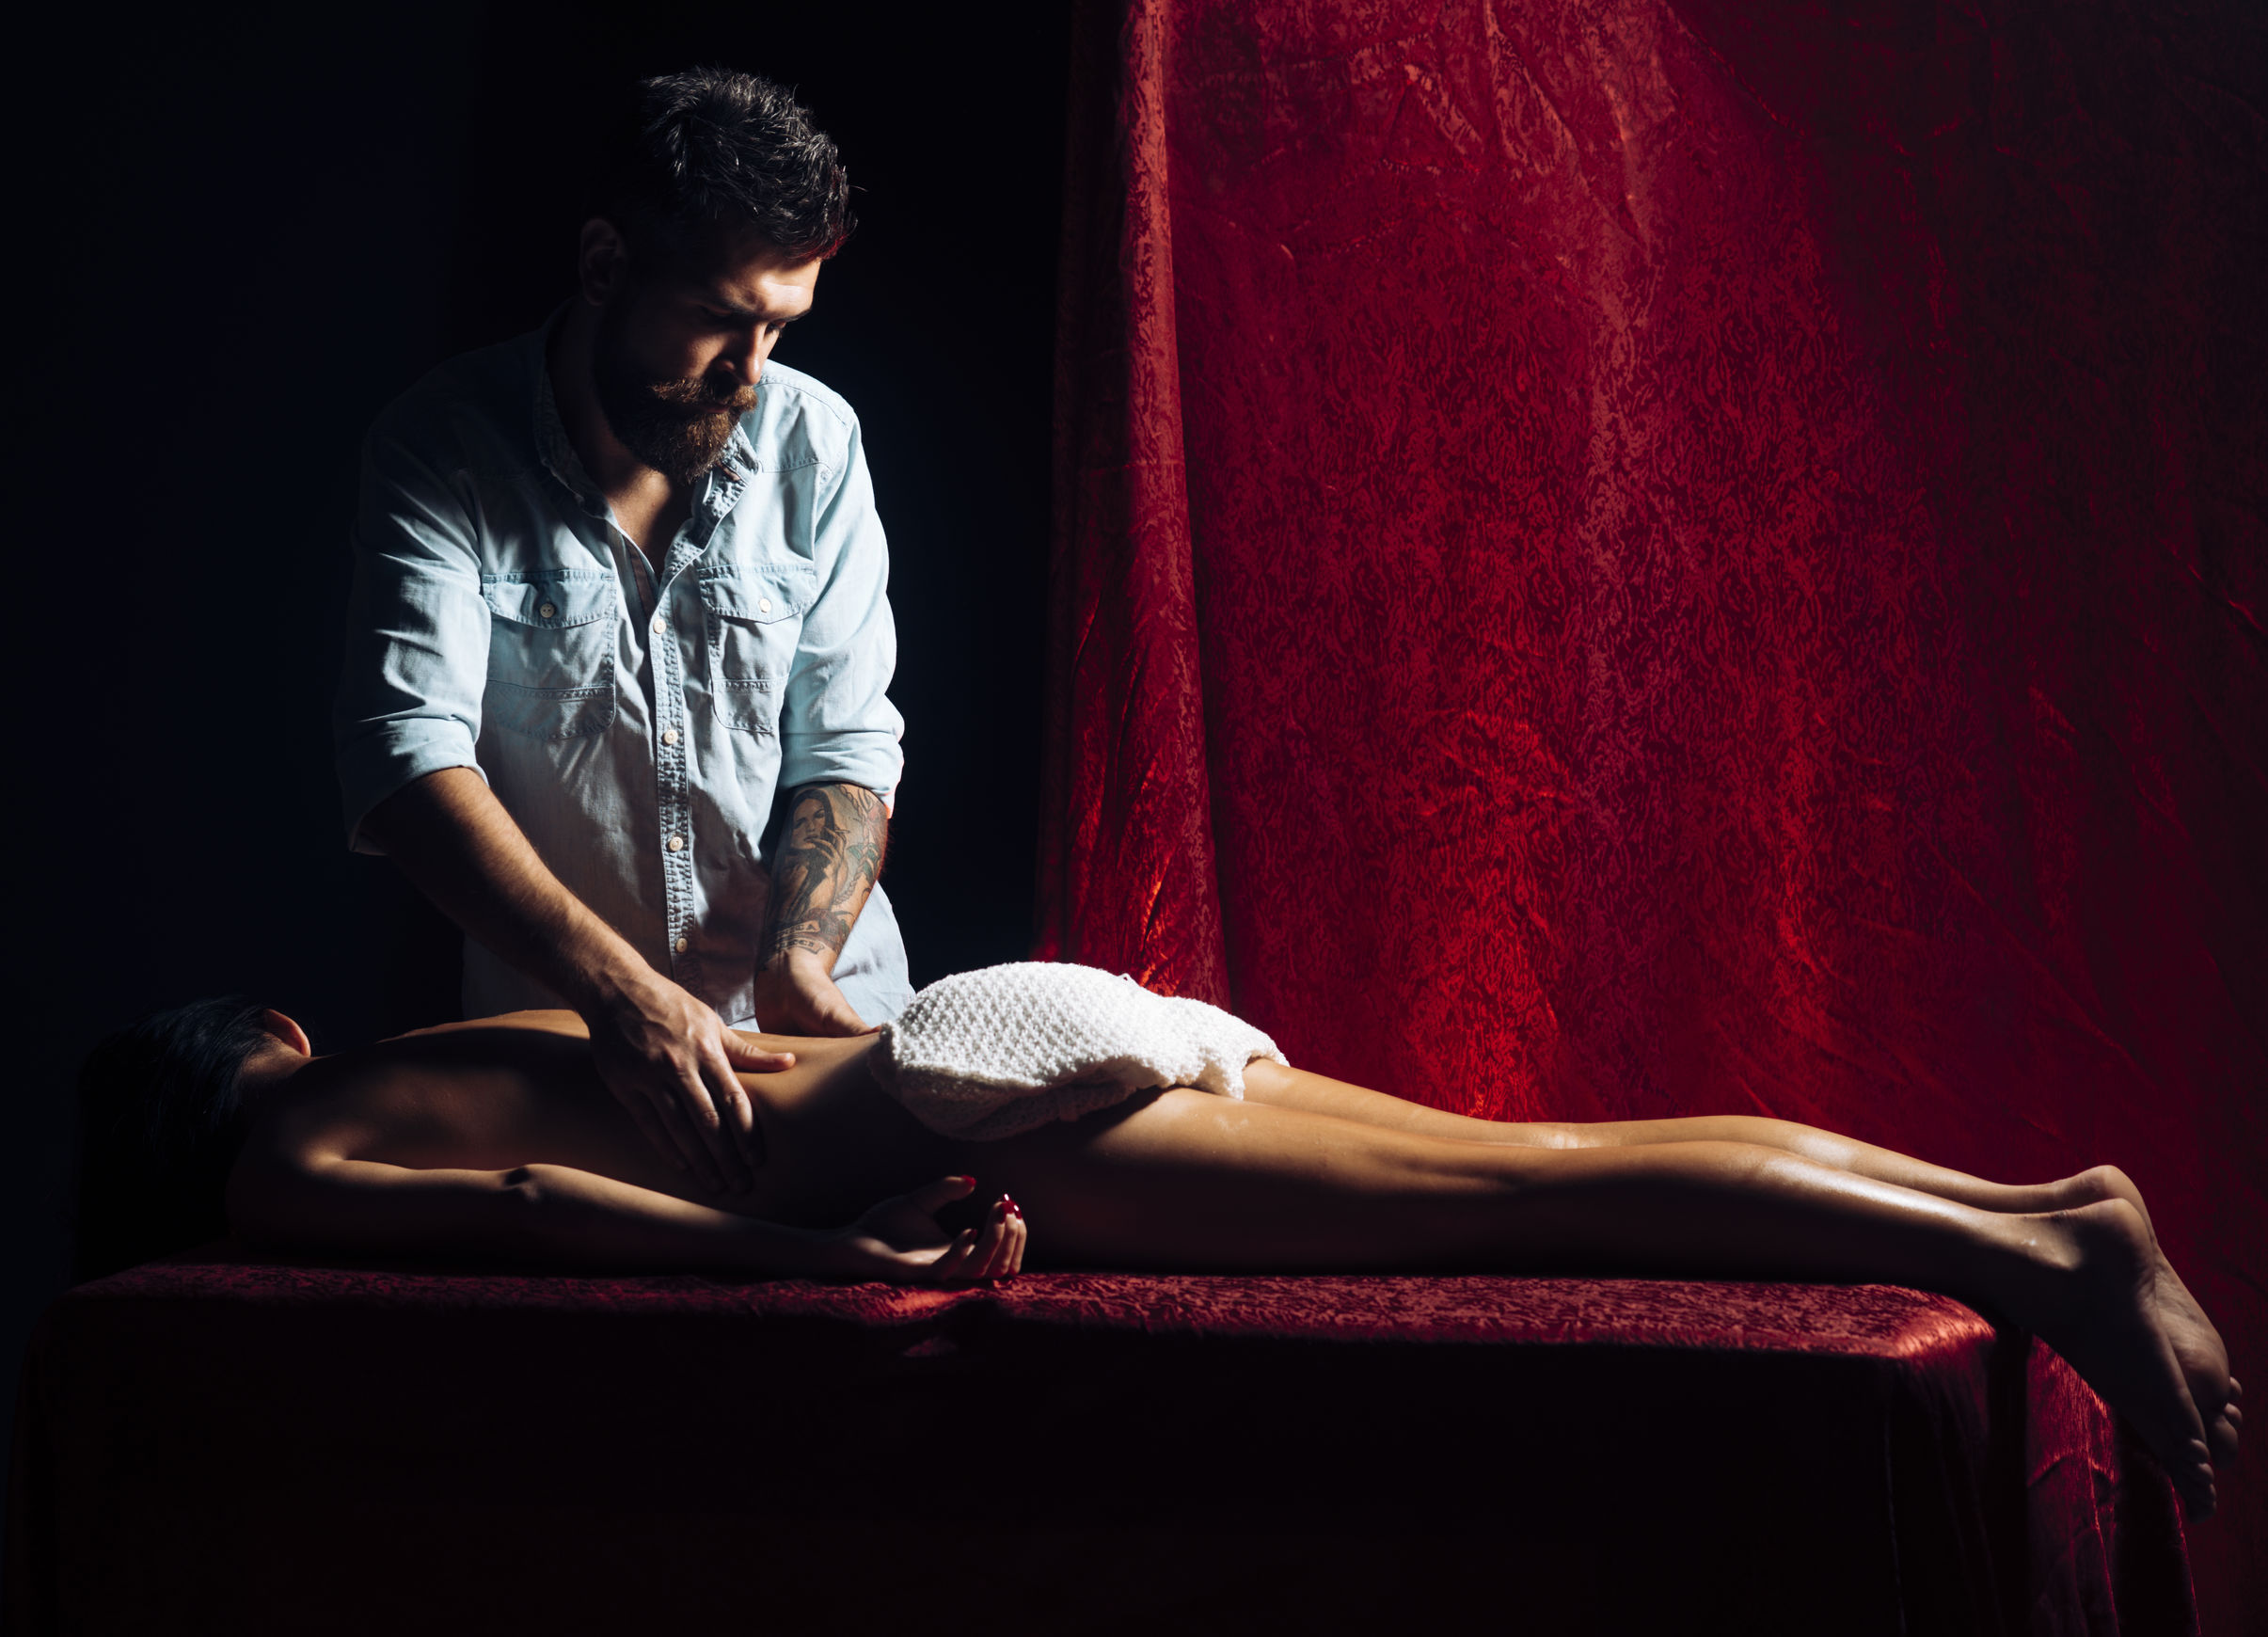 Outcall Massage Las Vegas-In Room Massage-Best Massage Las Vegas